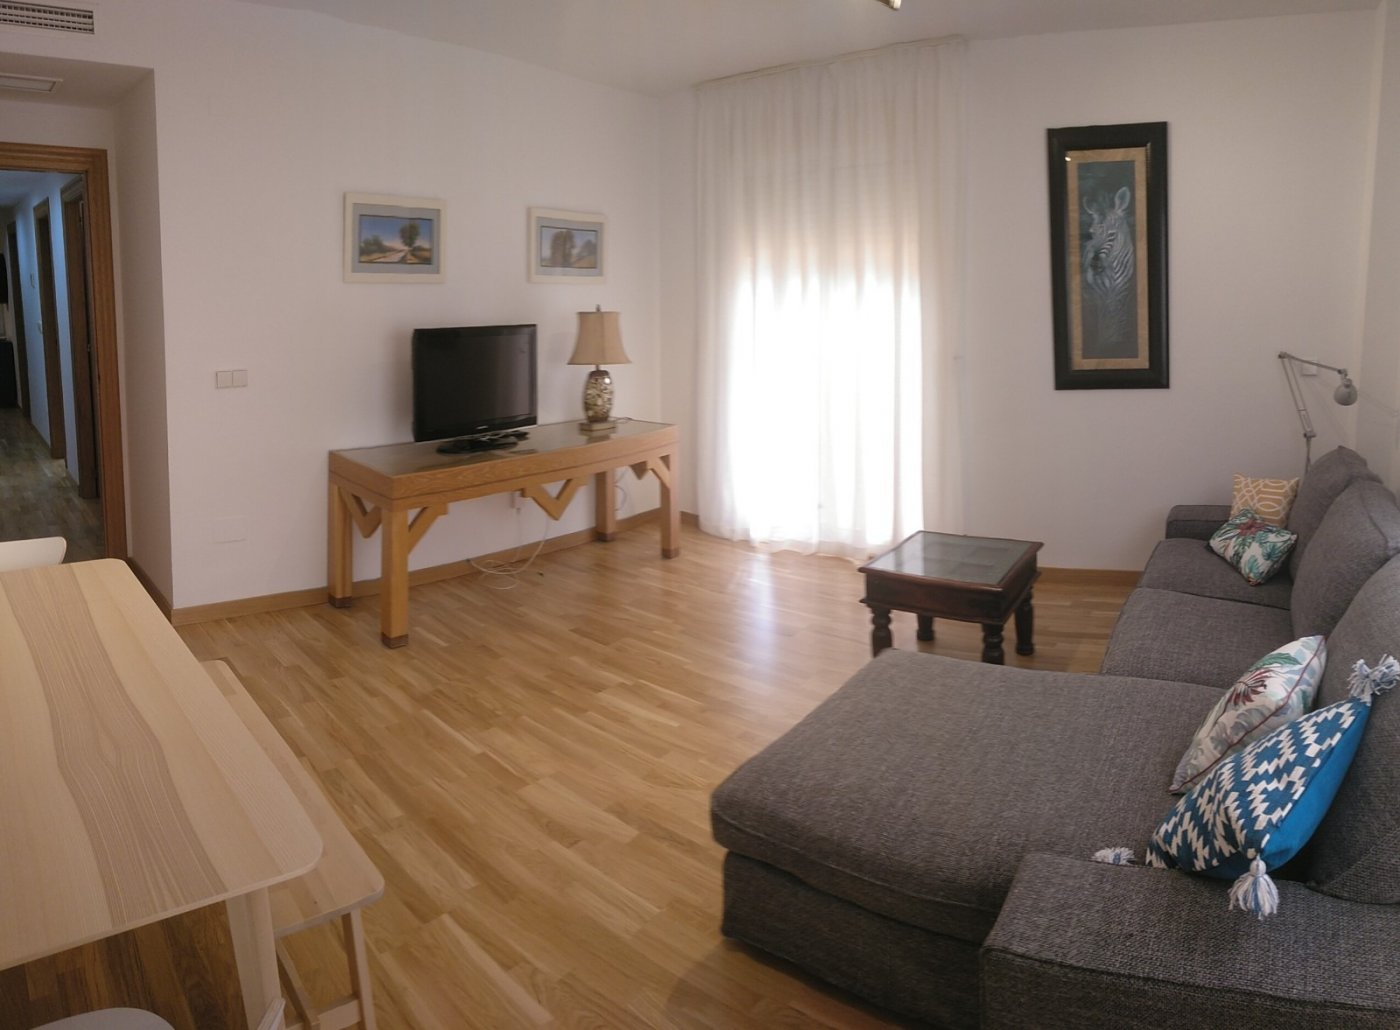 Flat for rent in Casco Antiguo, Cartagena